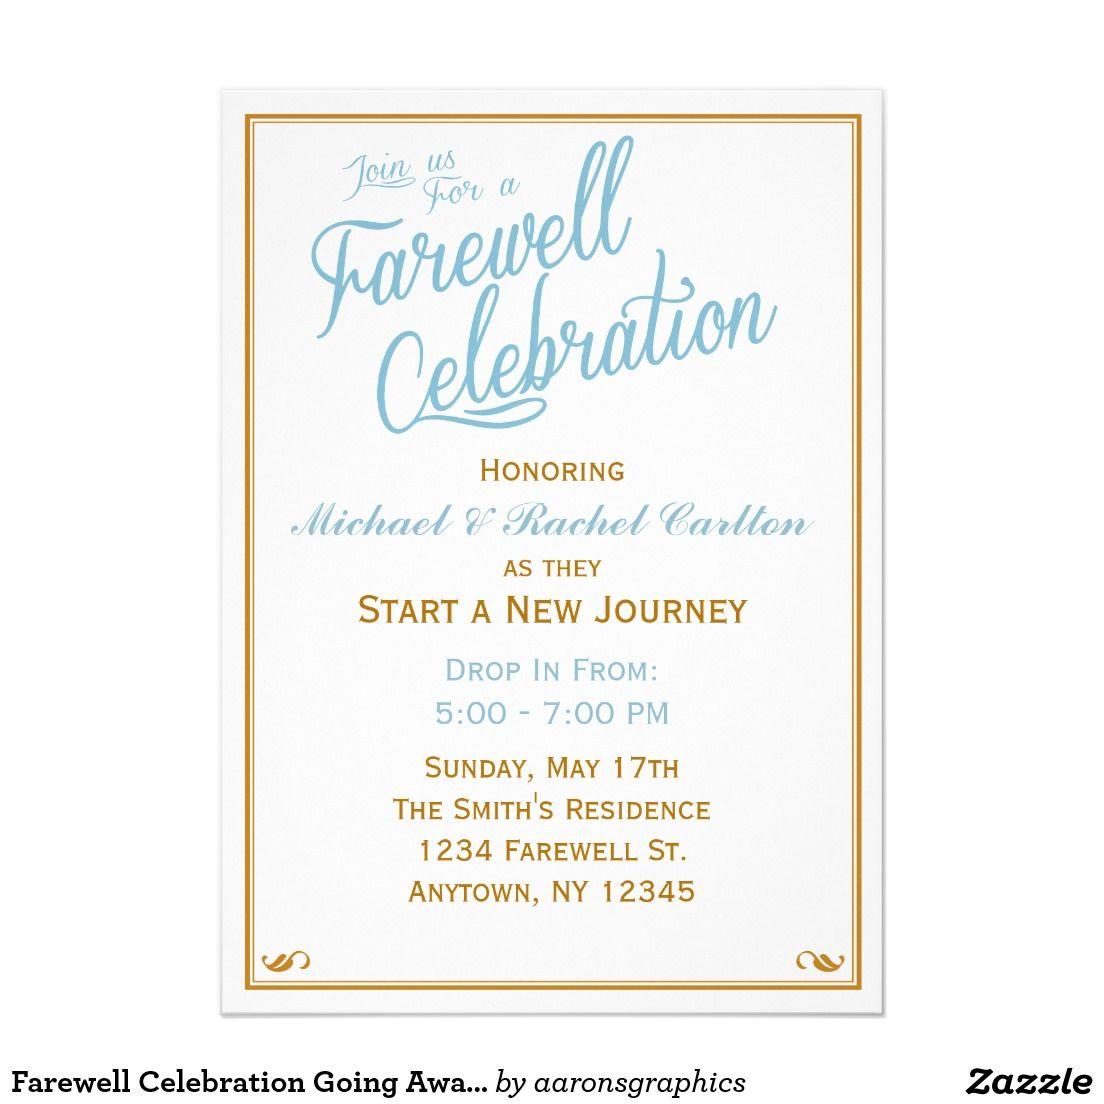 Farewell Celebration Going Away Invitation Zazzle Com Farewell Invitation Card Invitation Card Party Farewell Party Invitations